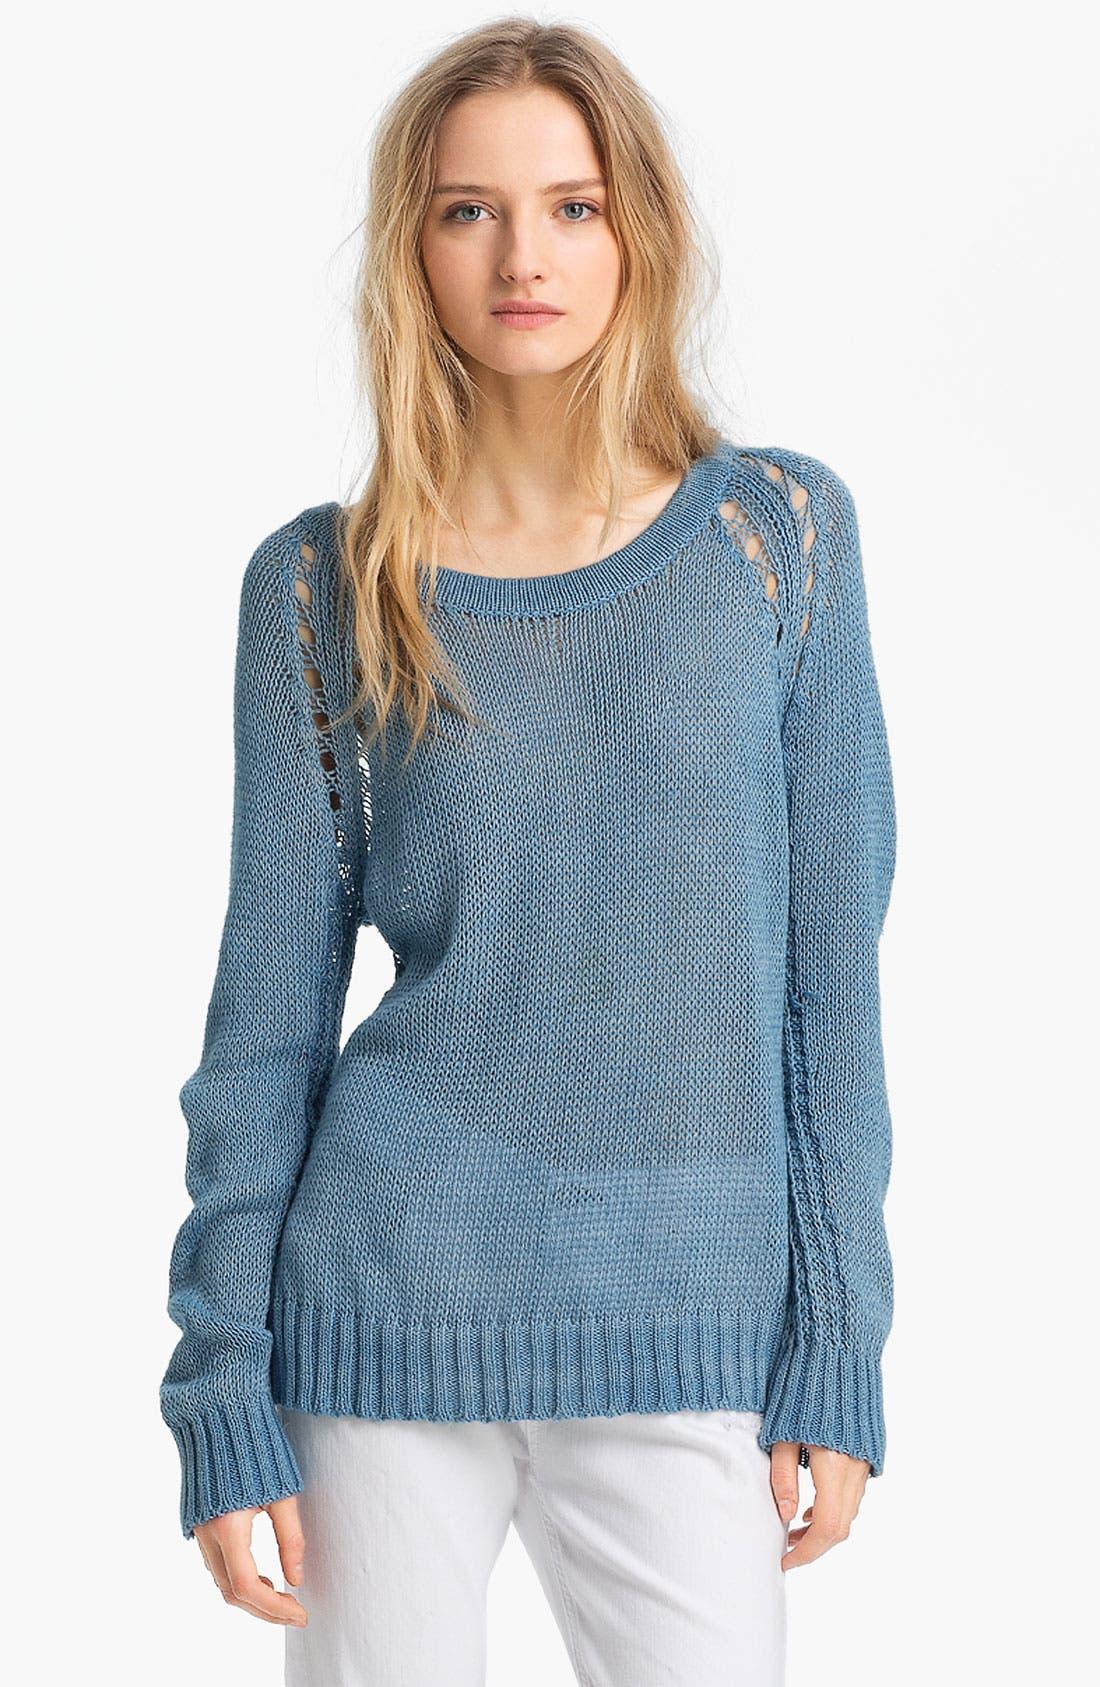 Main Image - rag & bone/JEAN 'Bay' Sweater